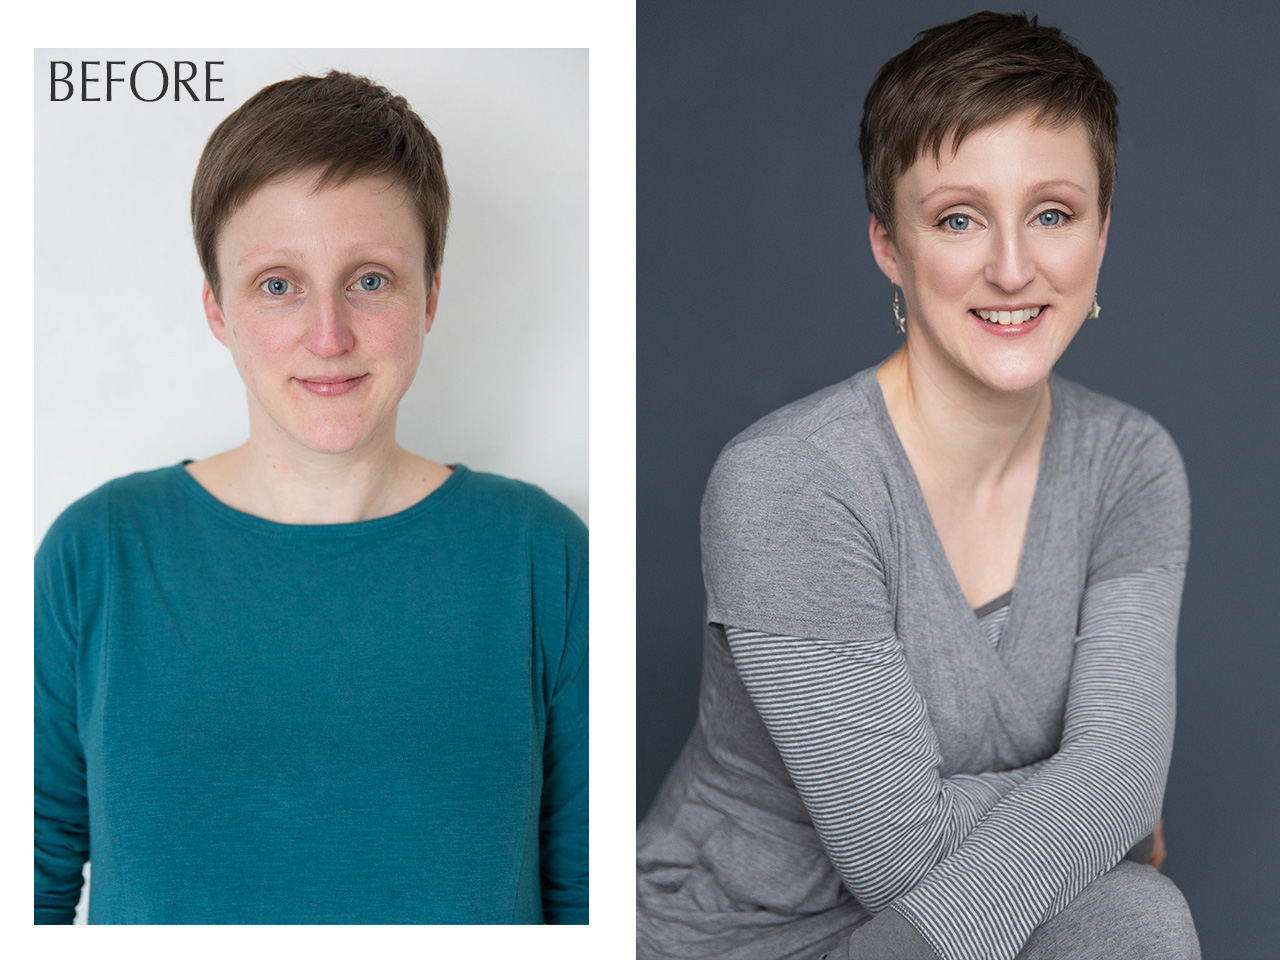 SaSa Before & After Personal Branding Carola Moon Portraits Wallingford Oxfordshire UK.jpg